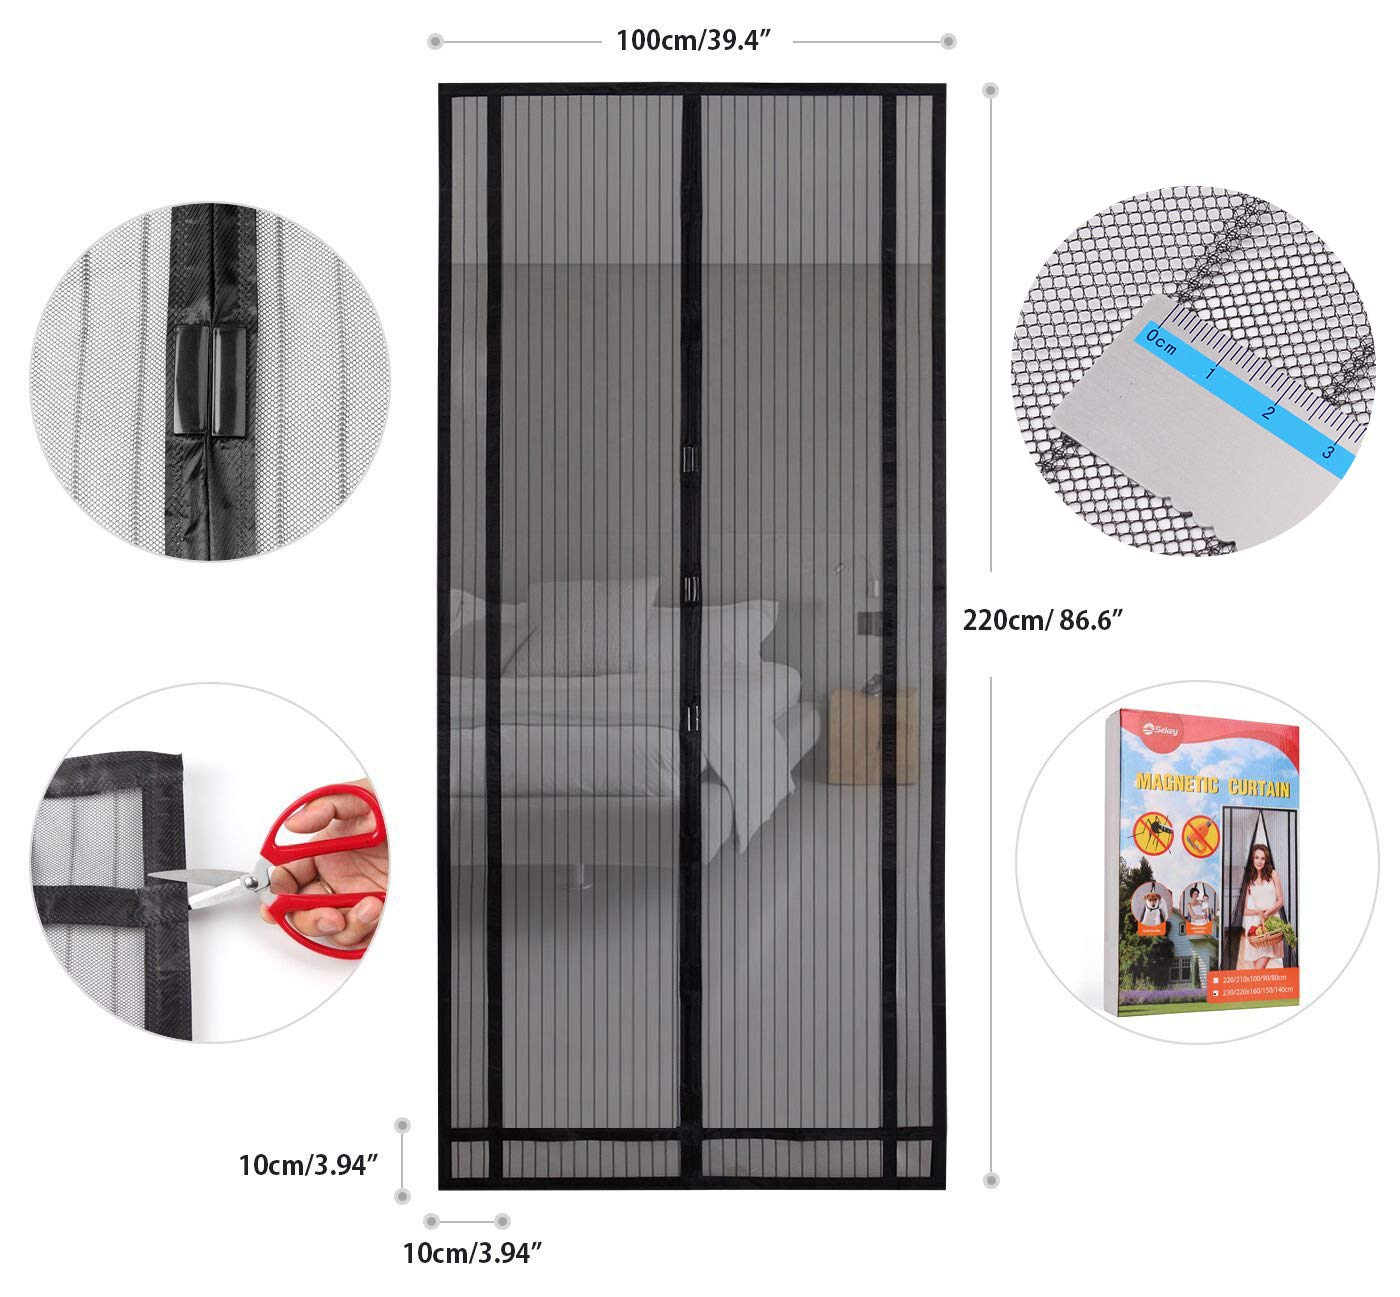 Sekey Magnetic Screen Door with Heavy Duty Fiberglass Mesh Curtain, Fits Door Size up to 39''X 86'' Max, Black